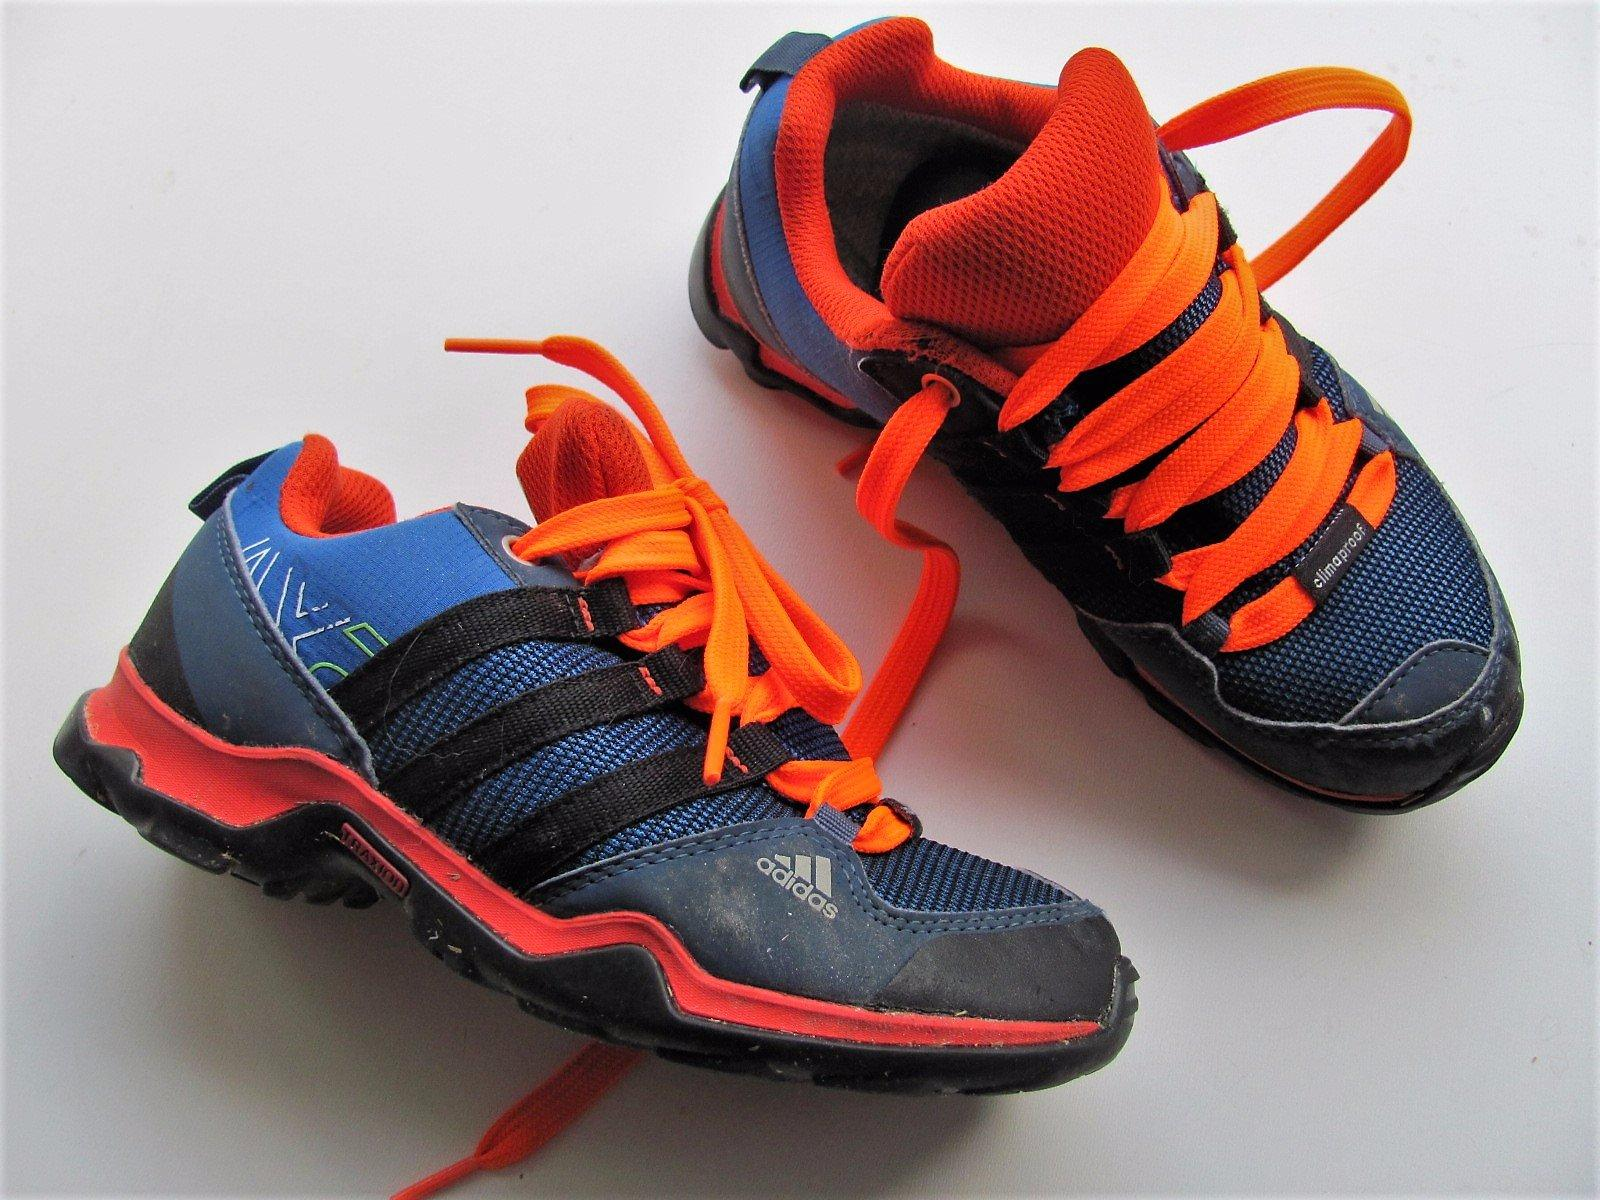 Dětské adidas trekové boty č.153, adidas,31 - 340 Kč Od ...